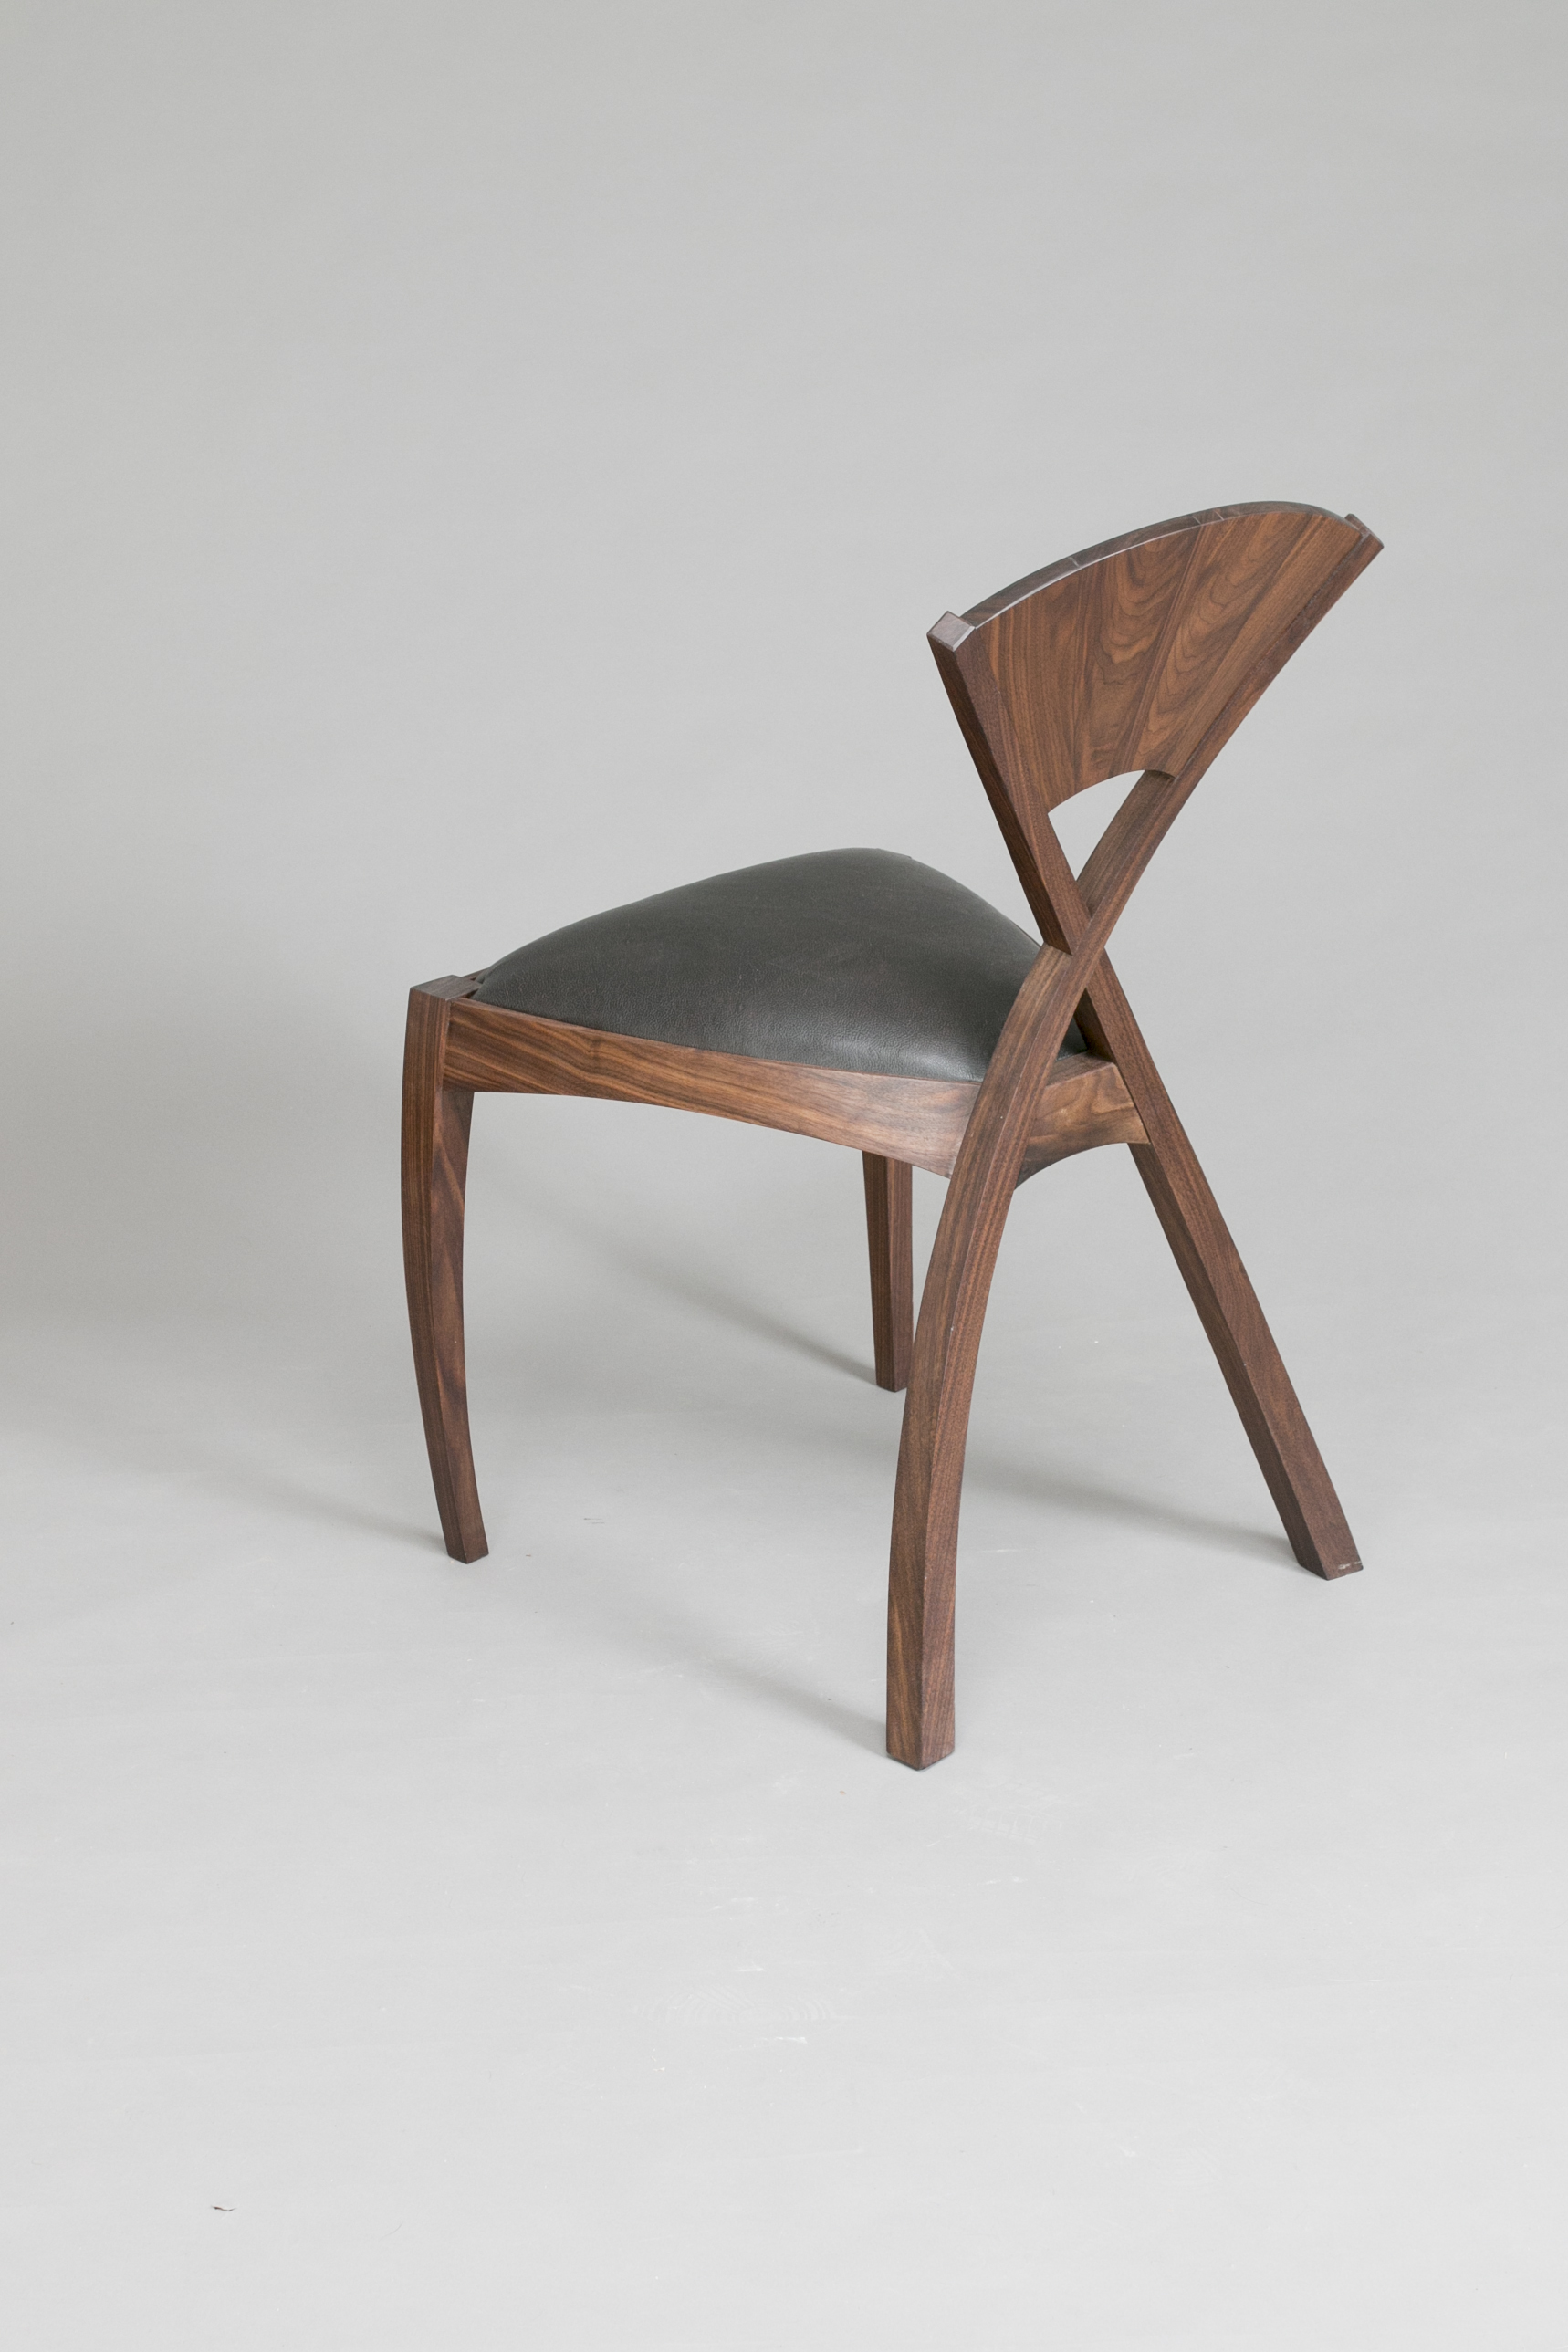 Michael Biggs - Chair Design